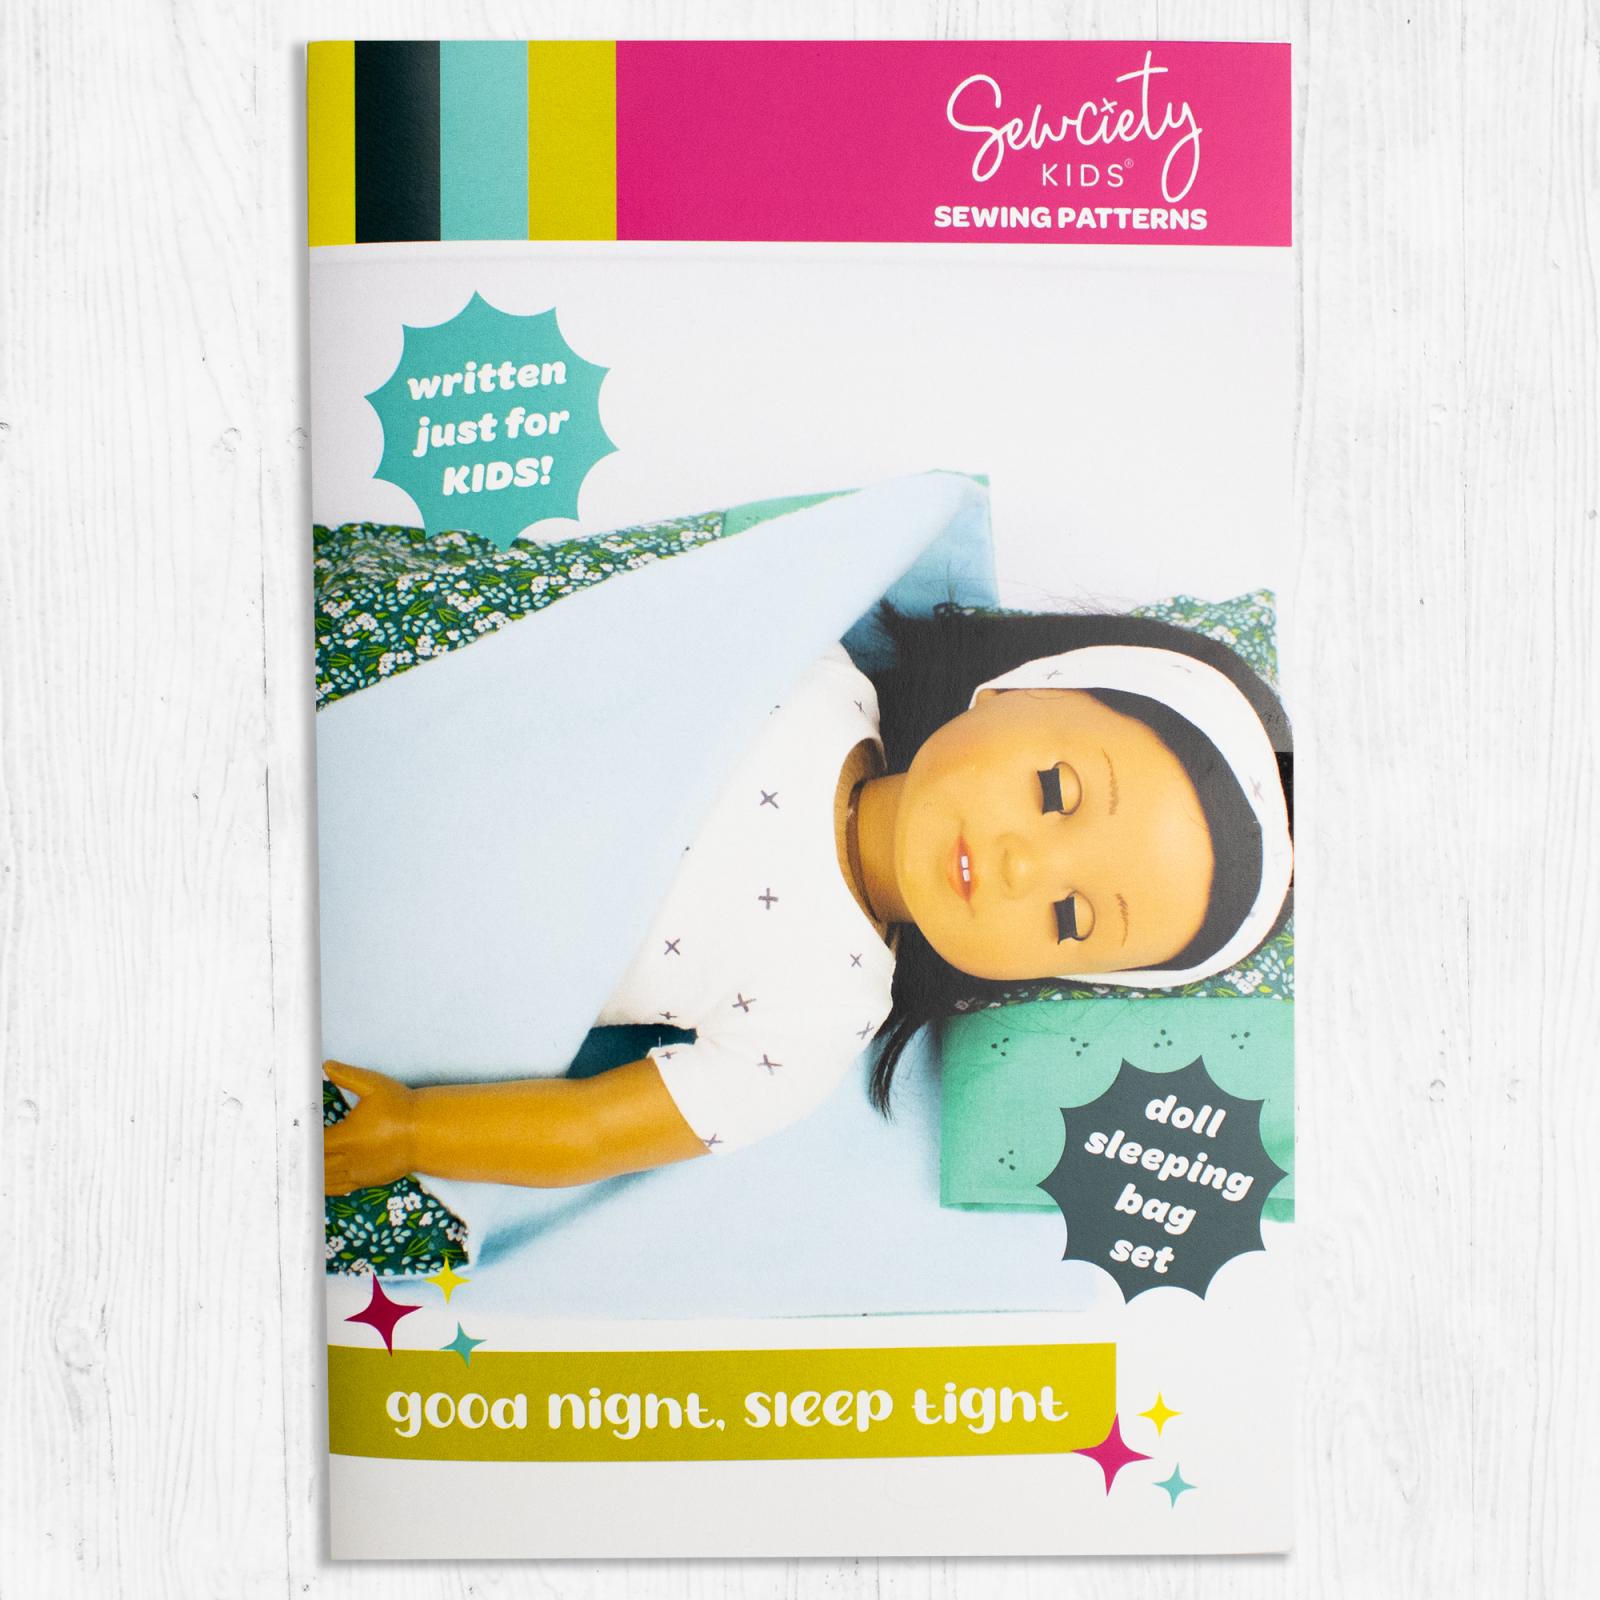 Sewciety Kids - Goodnight, Sleep Tight - Doll Sleeping Bag Set